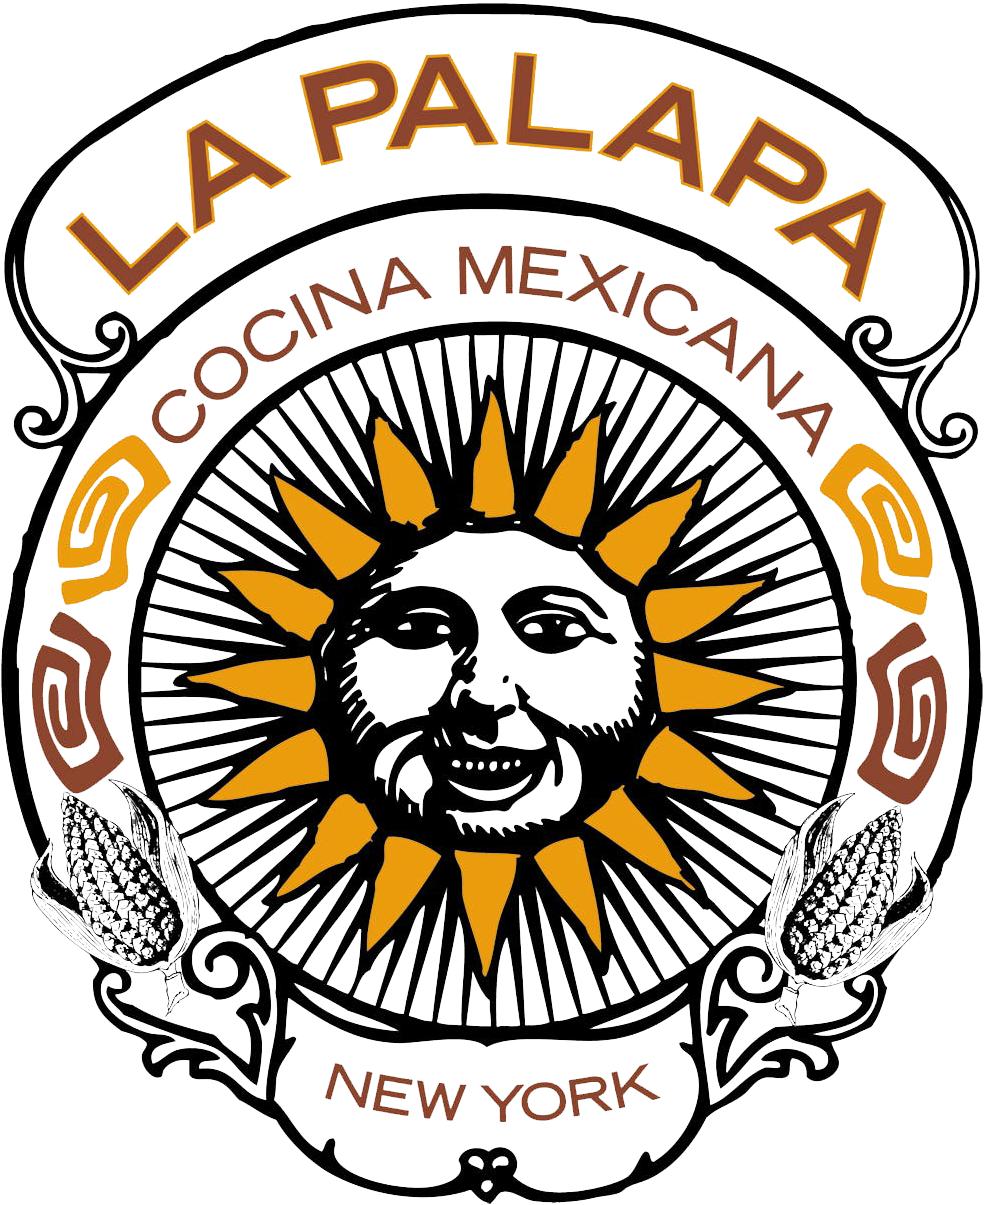 La Palapa Cocina Mexicana Home